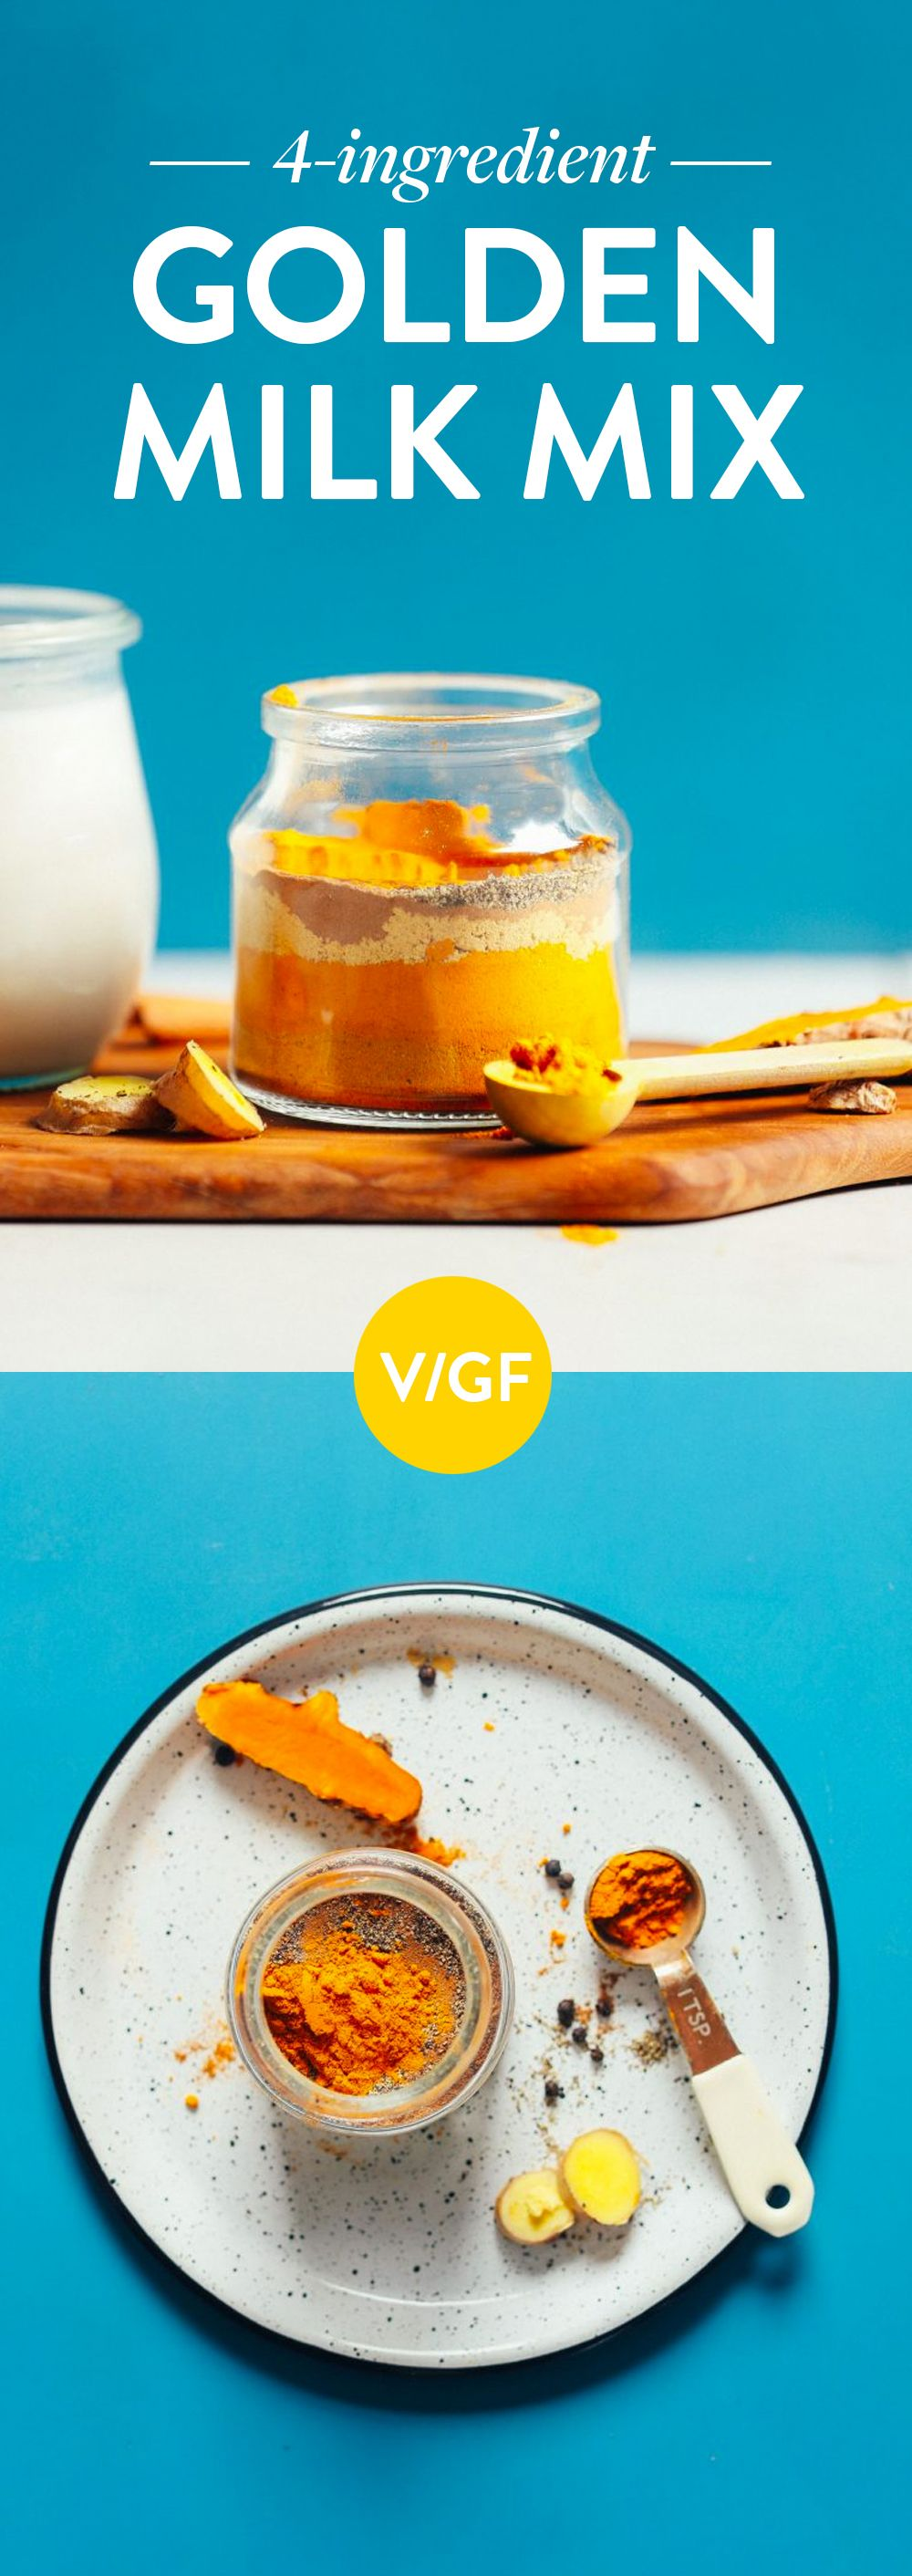 4Ingredient Golden Milk Mix Recipe Golden milk, Milk